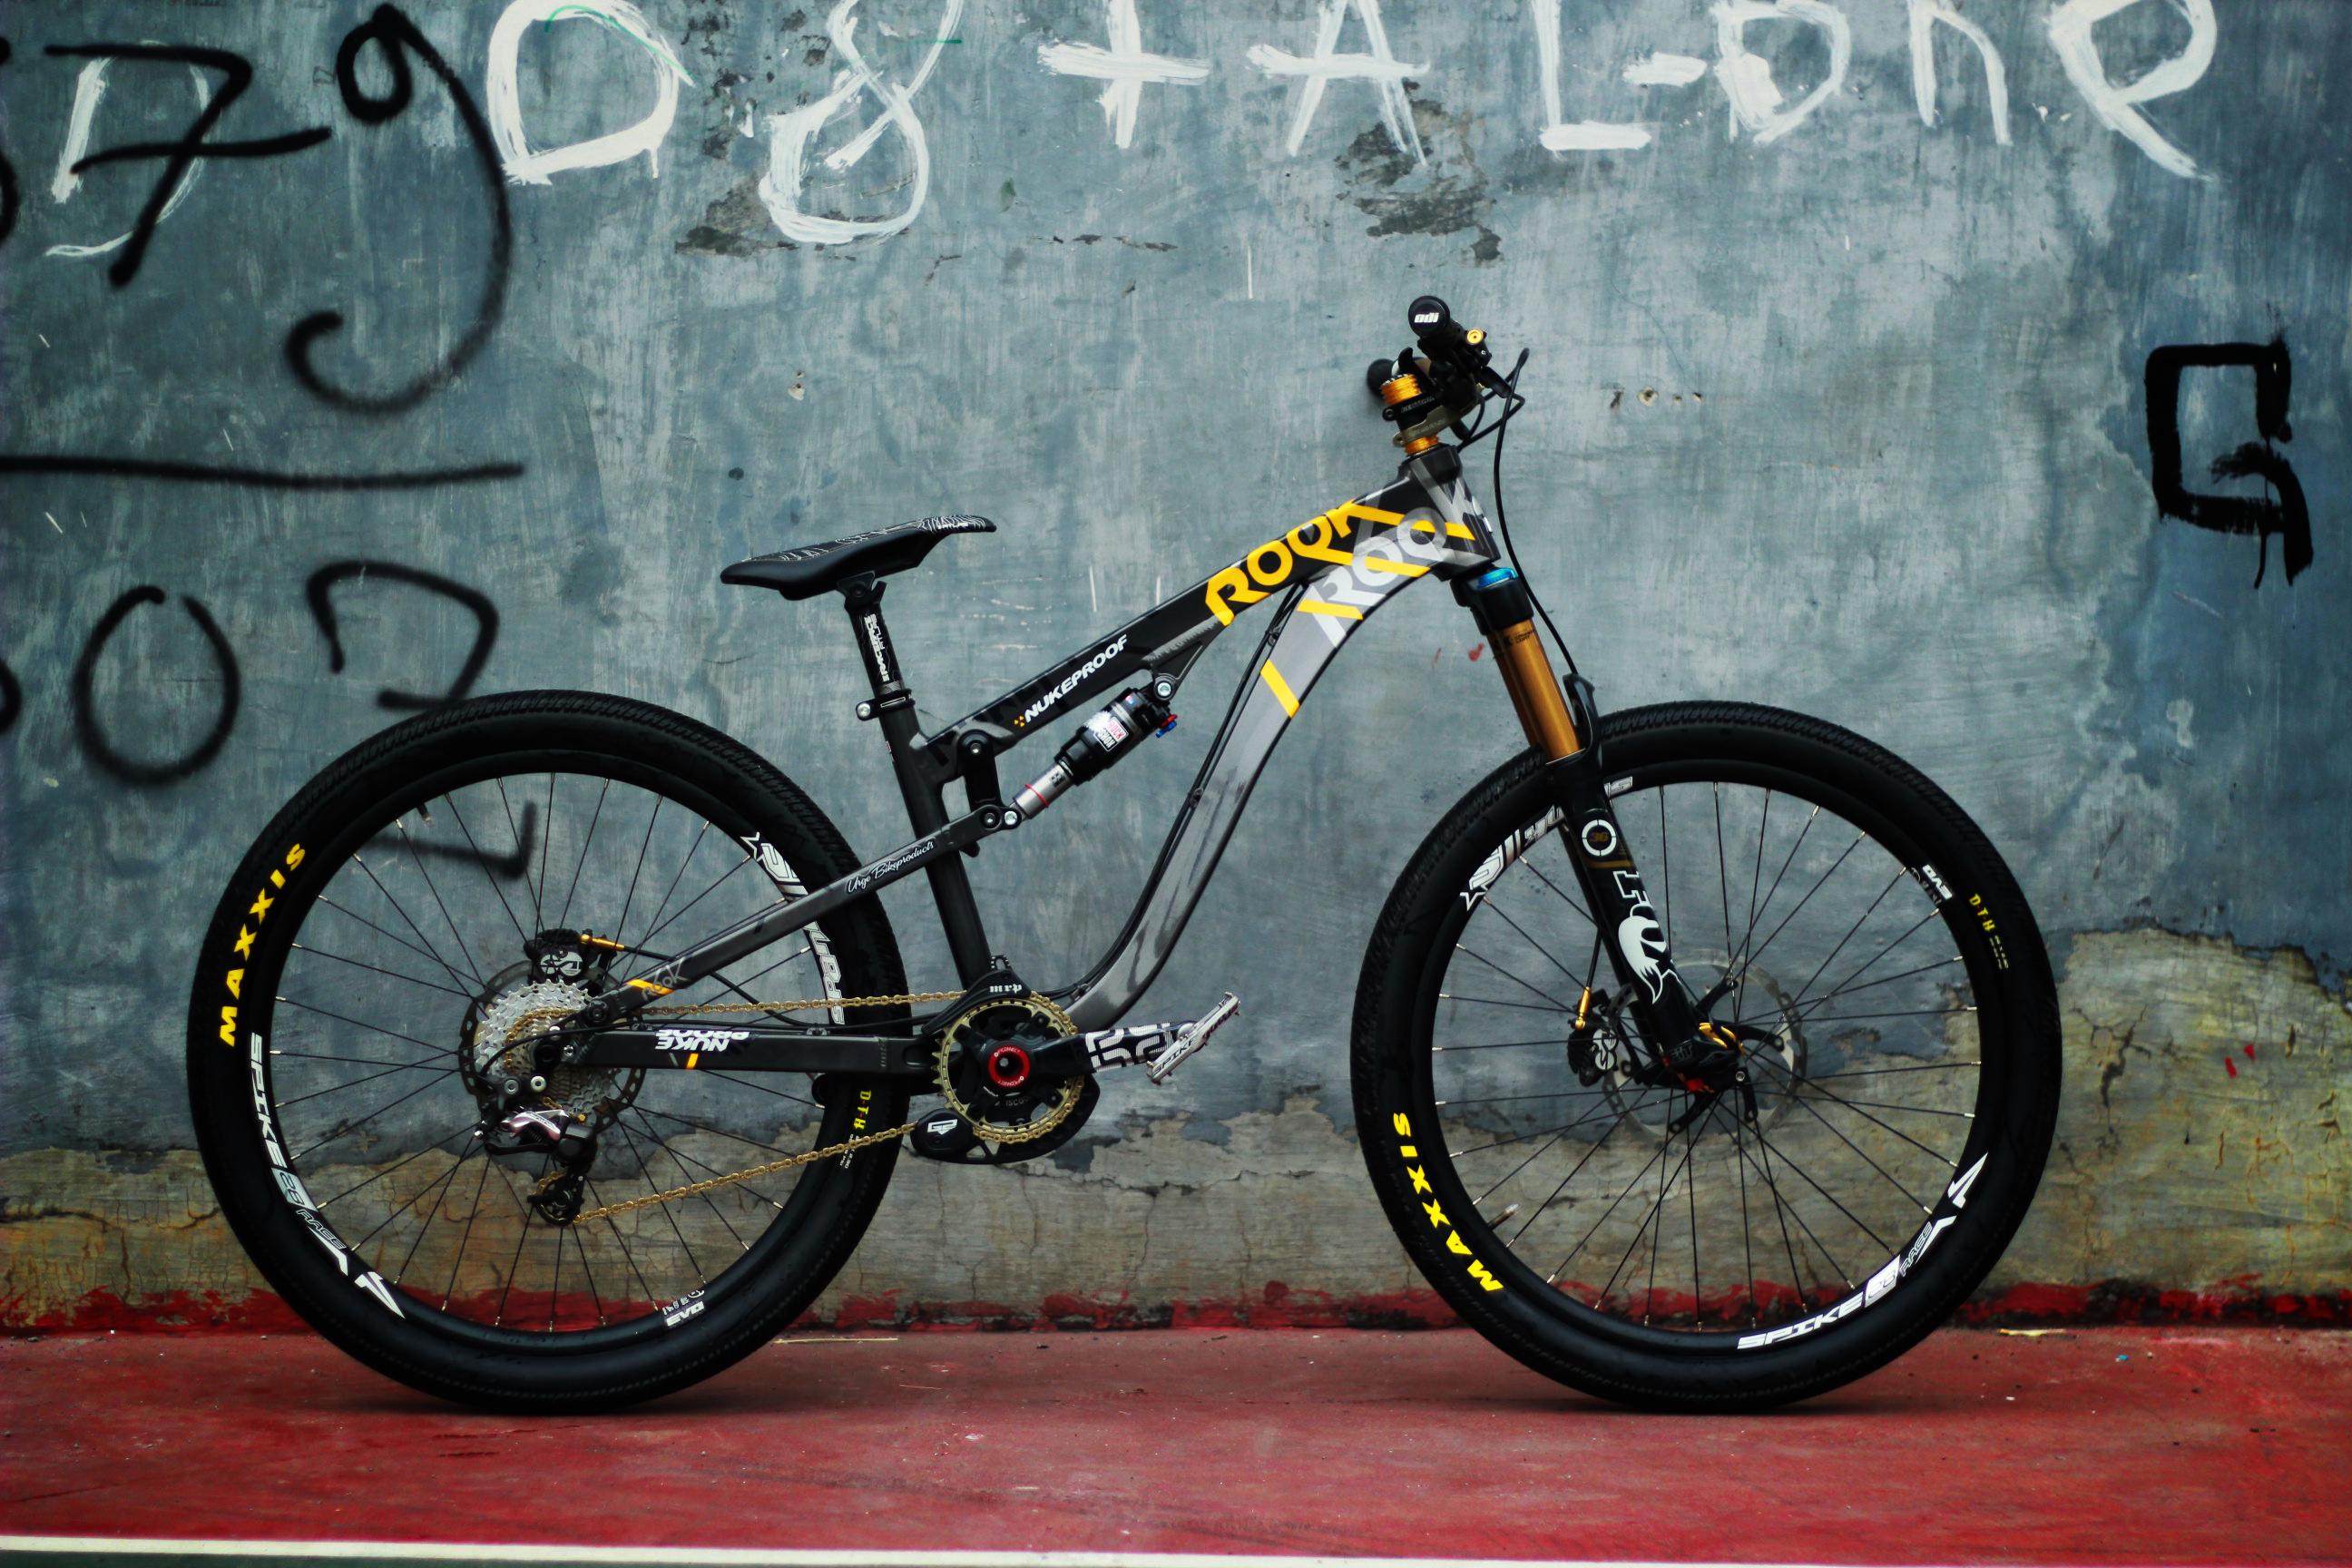 Slopestyle & Trail nukeproof ROOK! - aditya.bimantara's Bike Check - Vital MTB